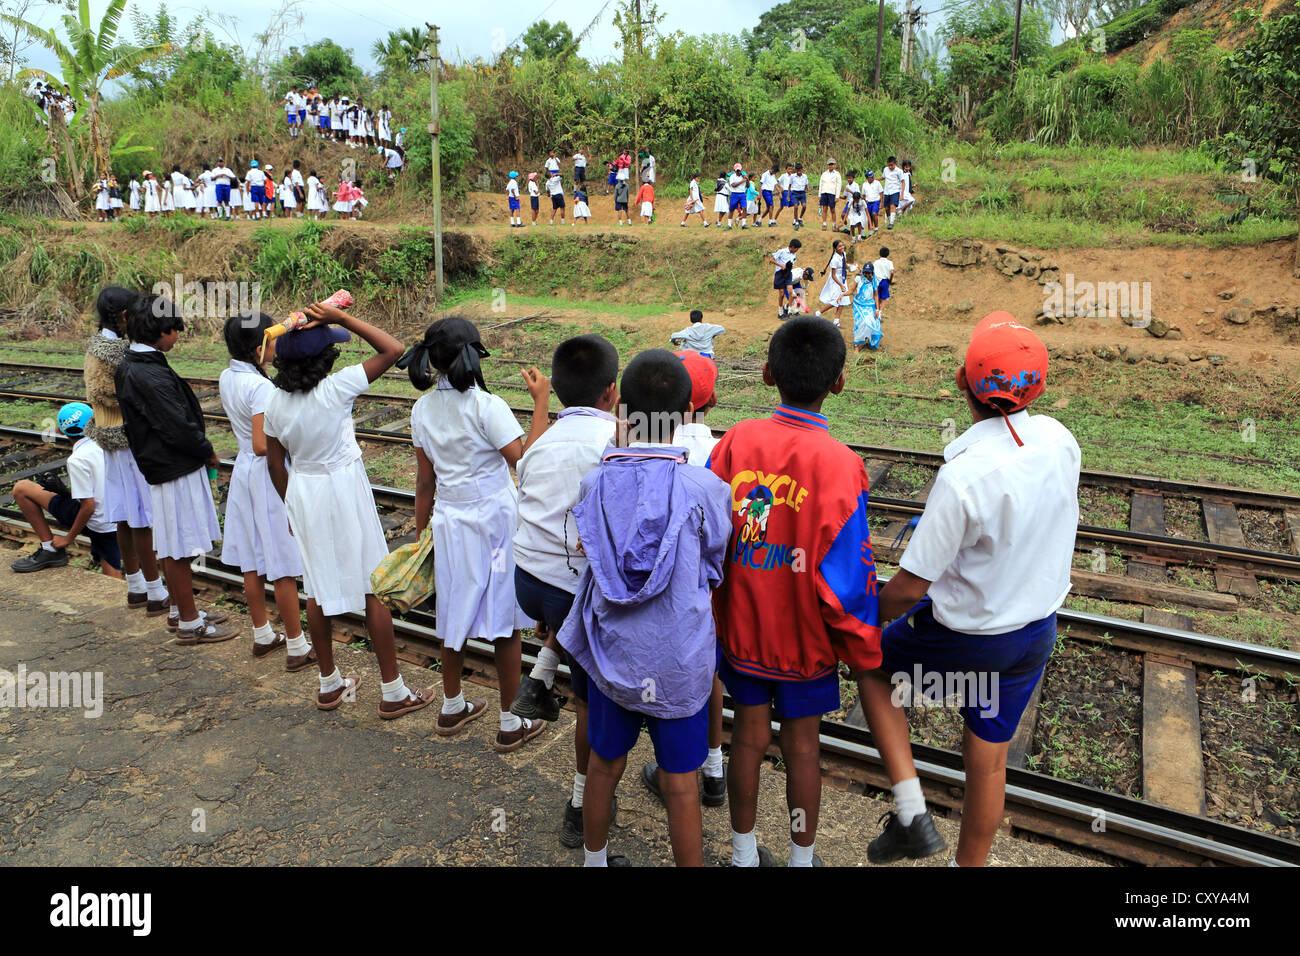 Schoolchildren at Demodara train station near Ella in the Sri Lanka highlands. Stock Photo